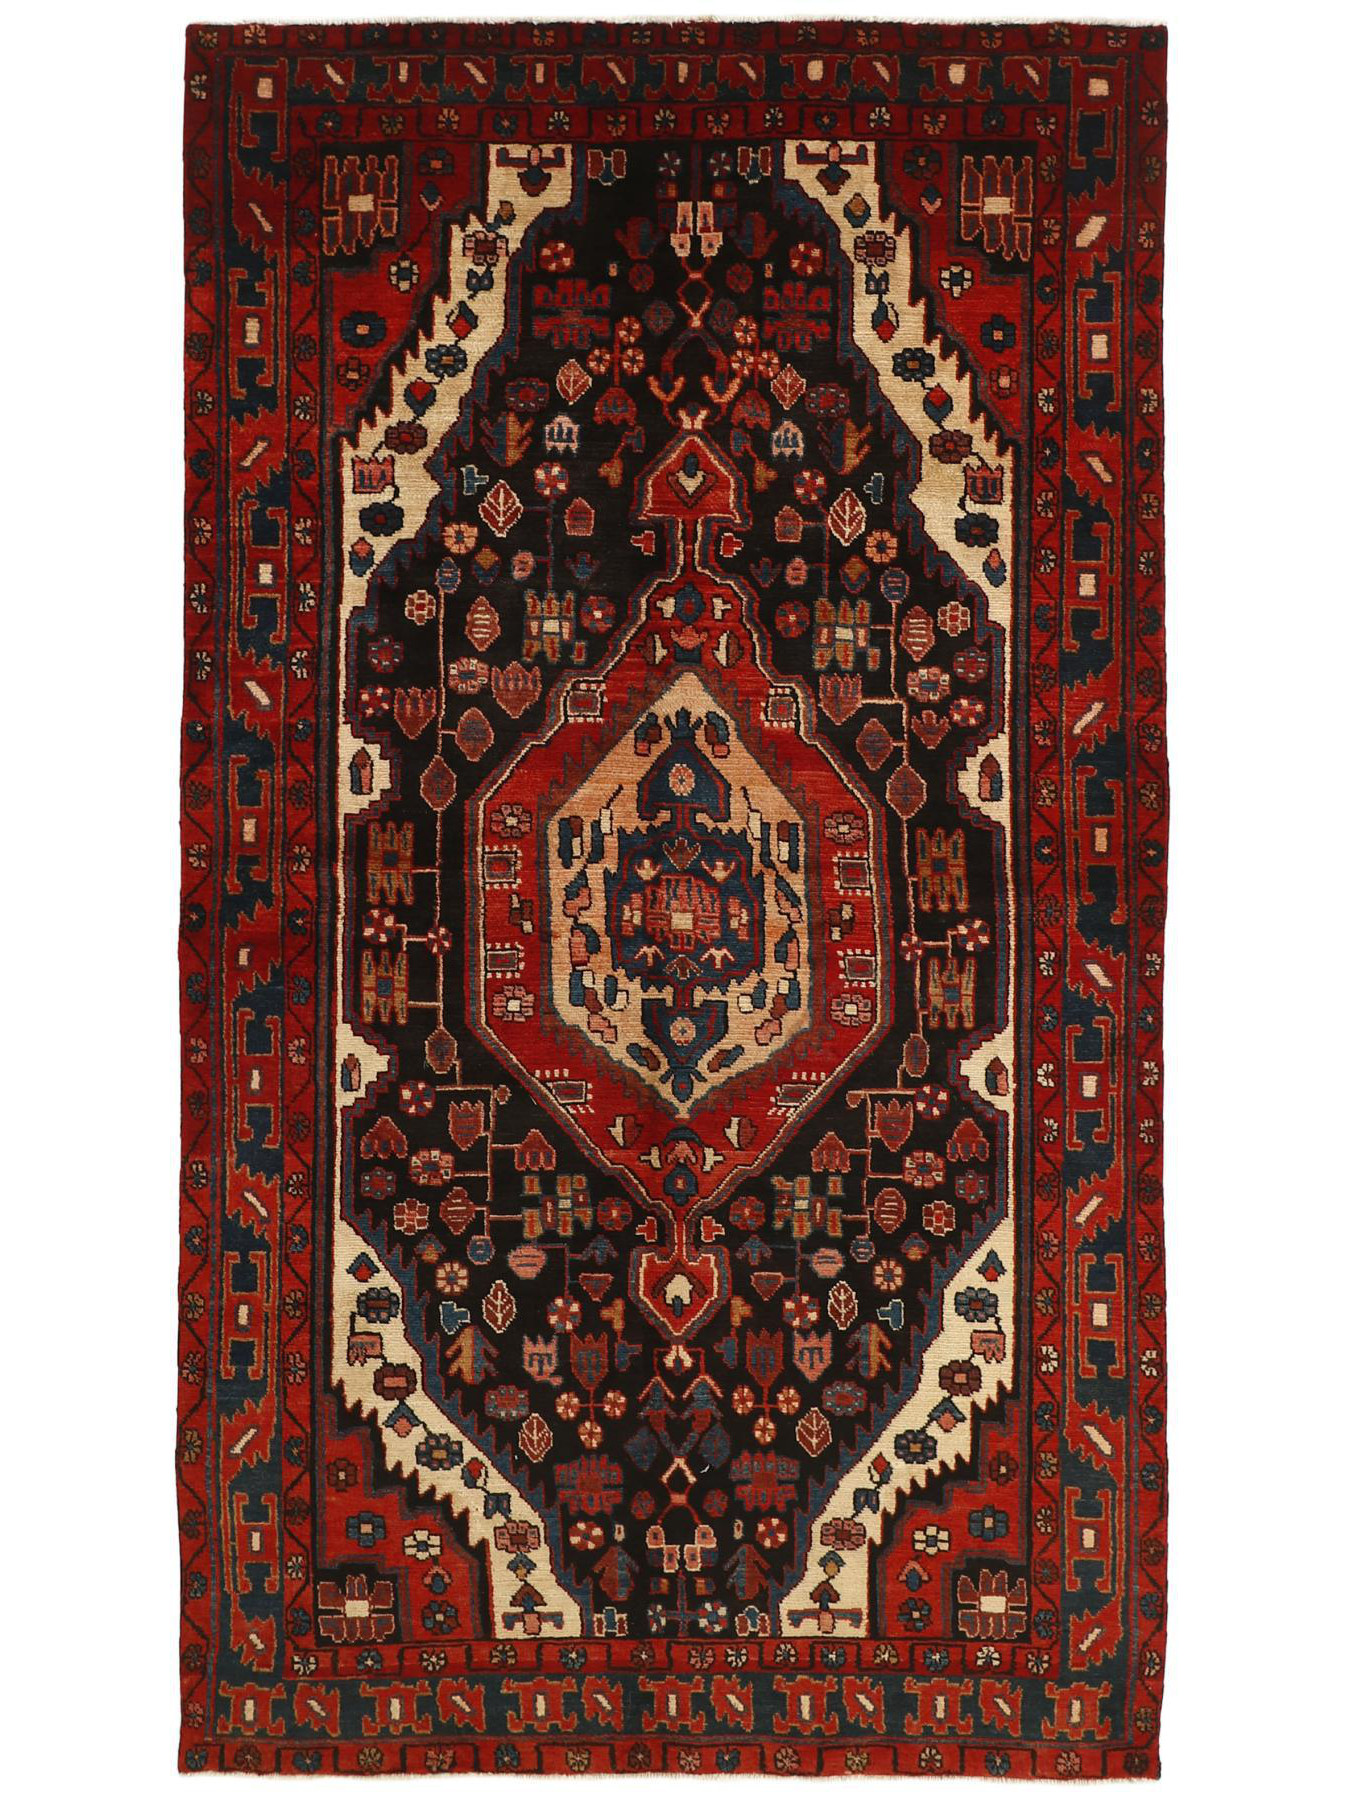 Tapis persans - Nahavand